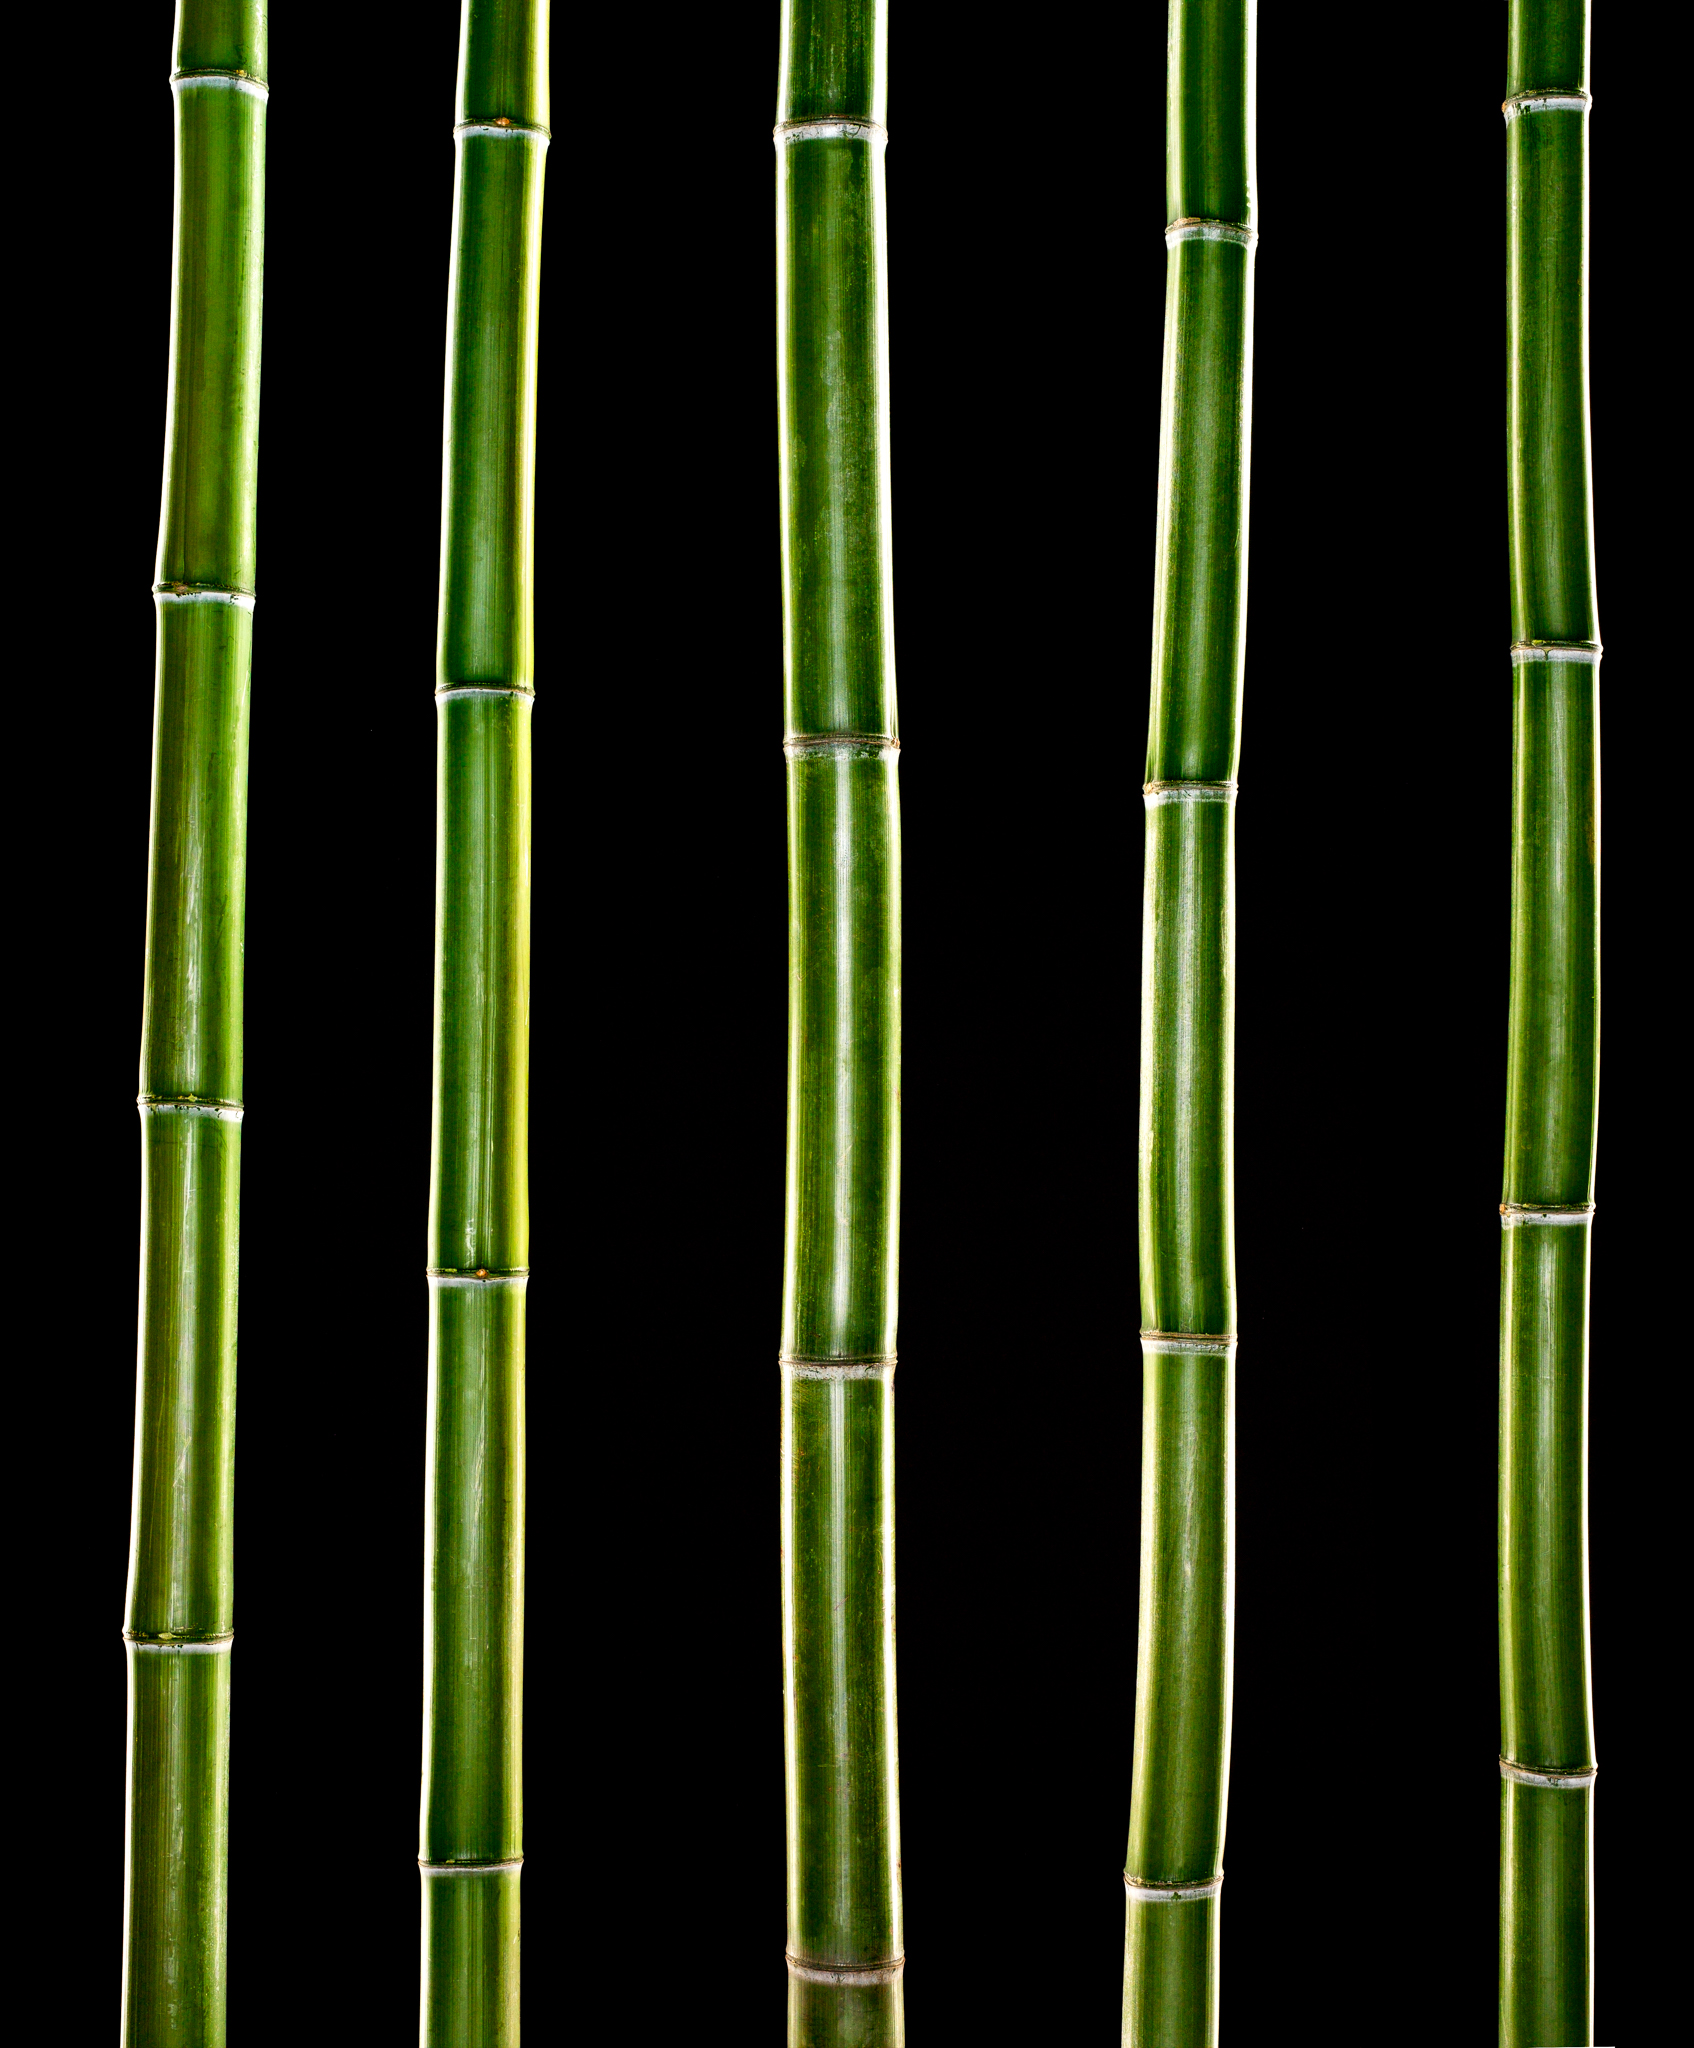 white_bamboo-plates_0023v1